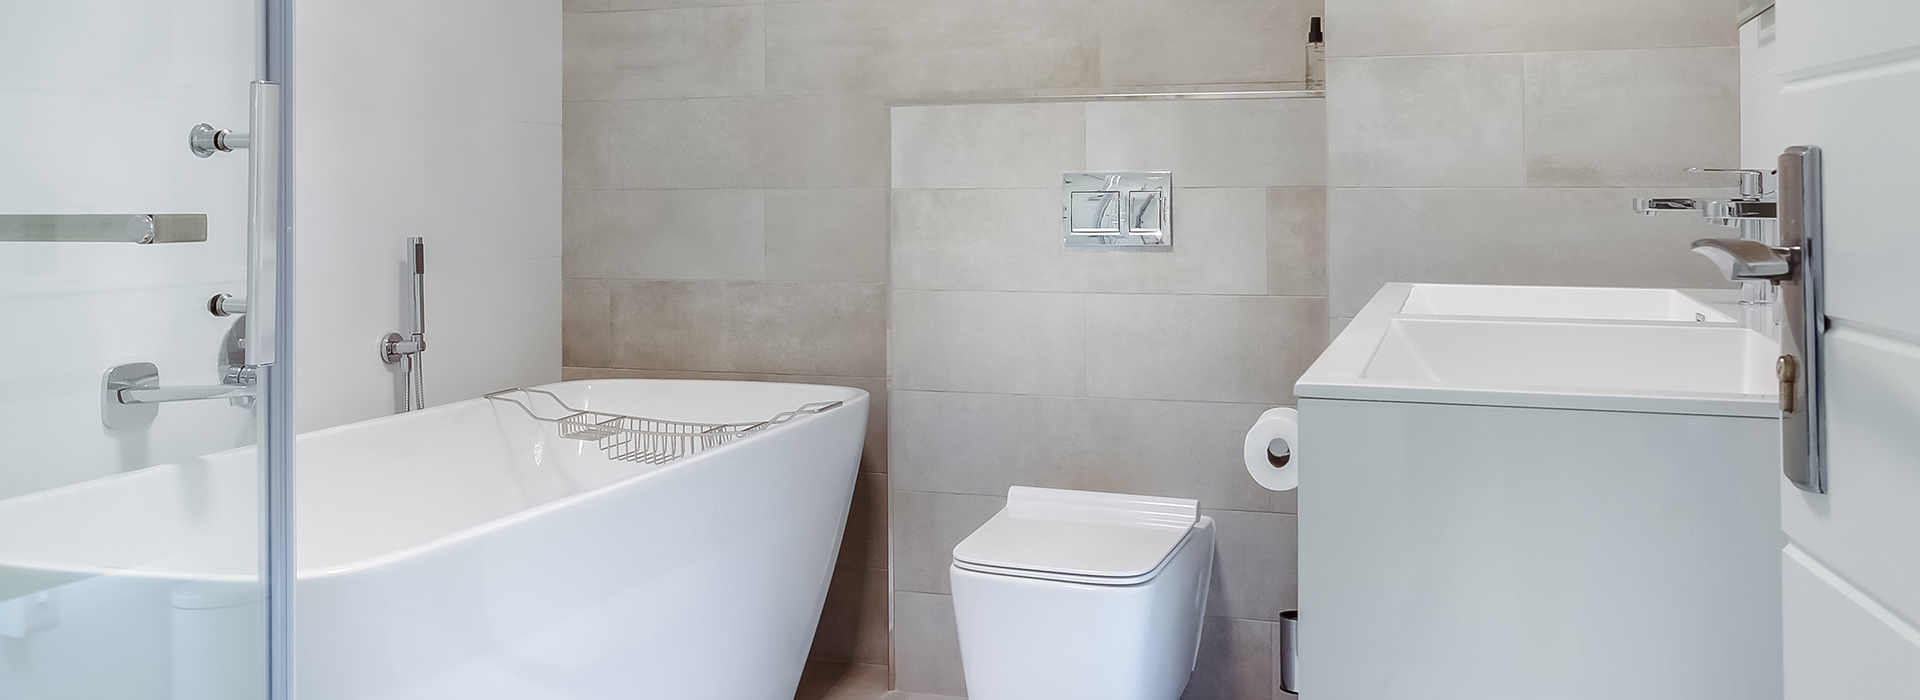 Modernes helles Badezimmer